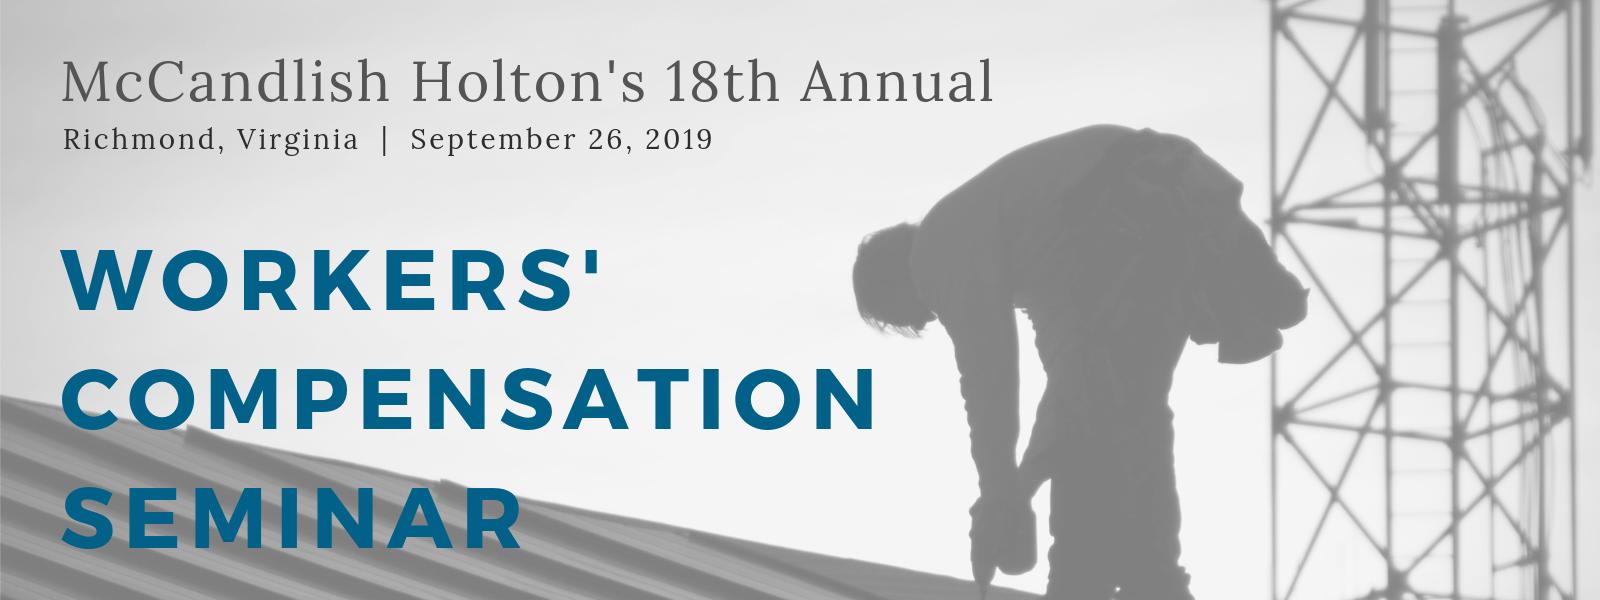 Workers' Compensation Seminar 2019_blog banner (2)